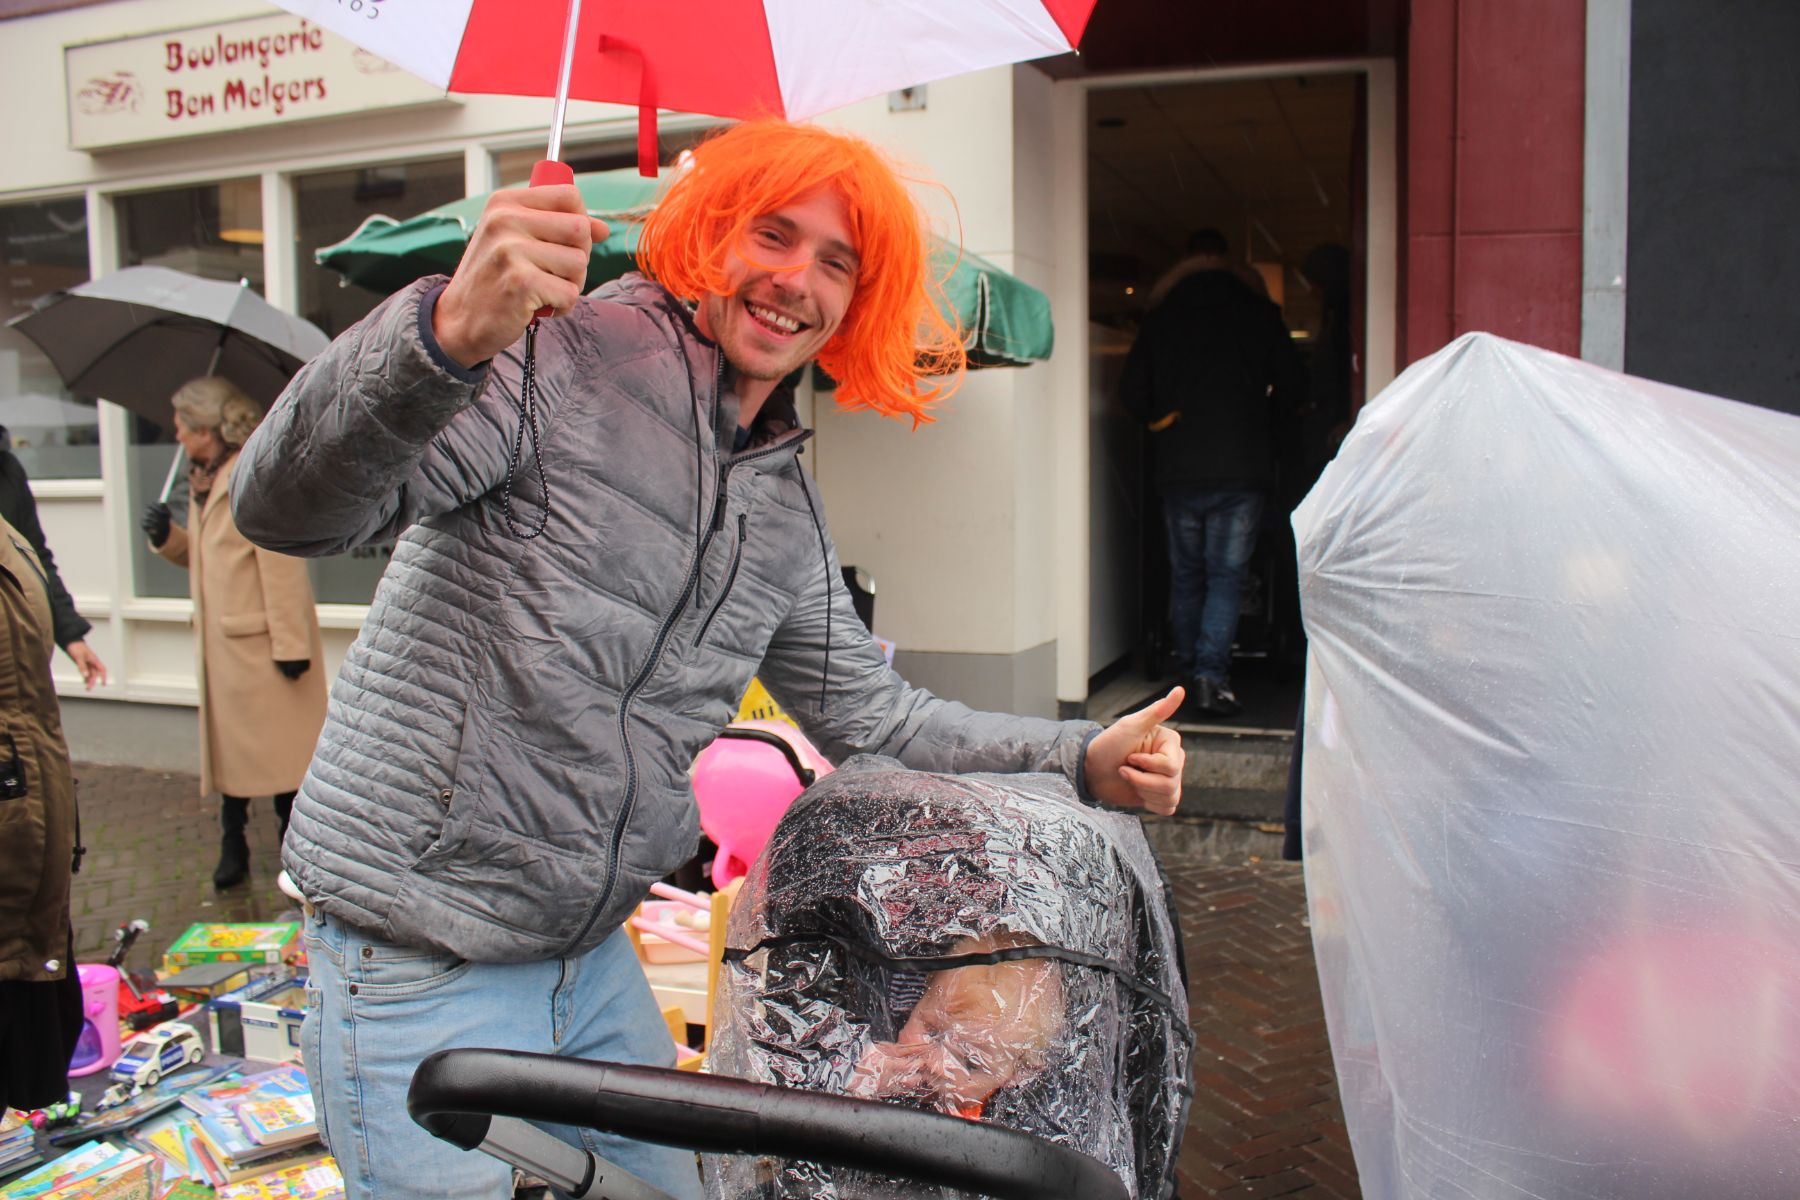 Koningsdag Doetinchem 2019 foto's Rowan Jansen 8